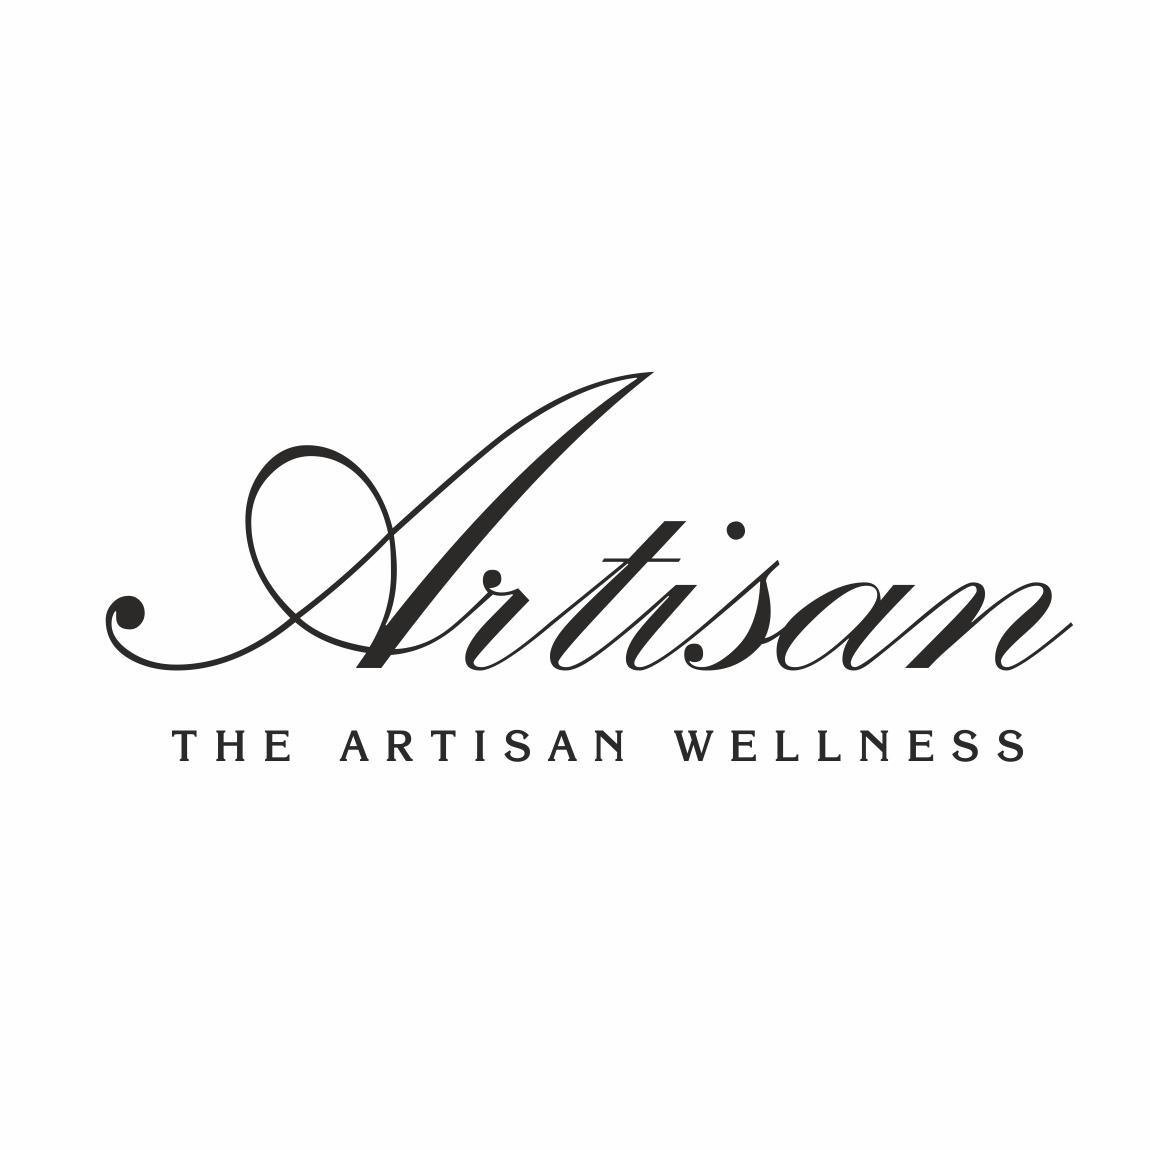 Picosure - ArtisanWellness.sg